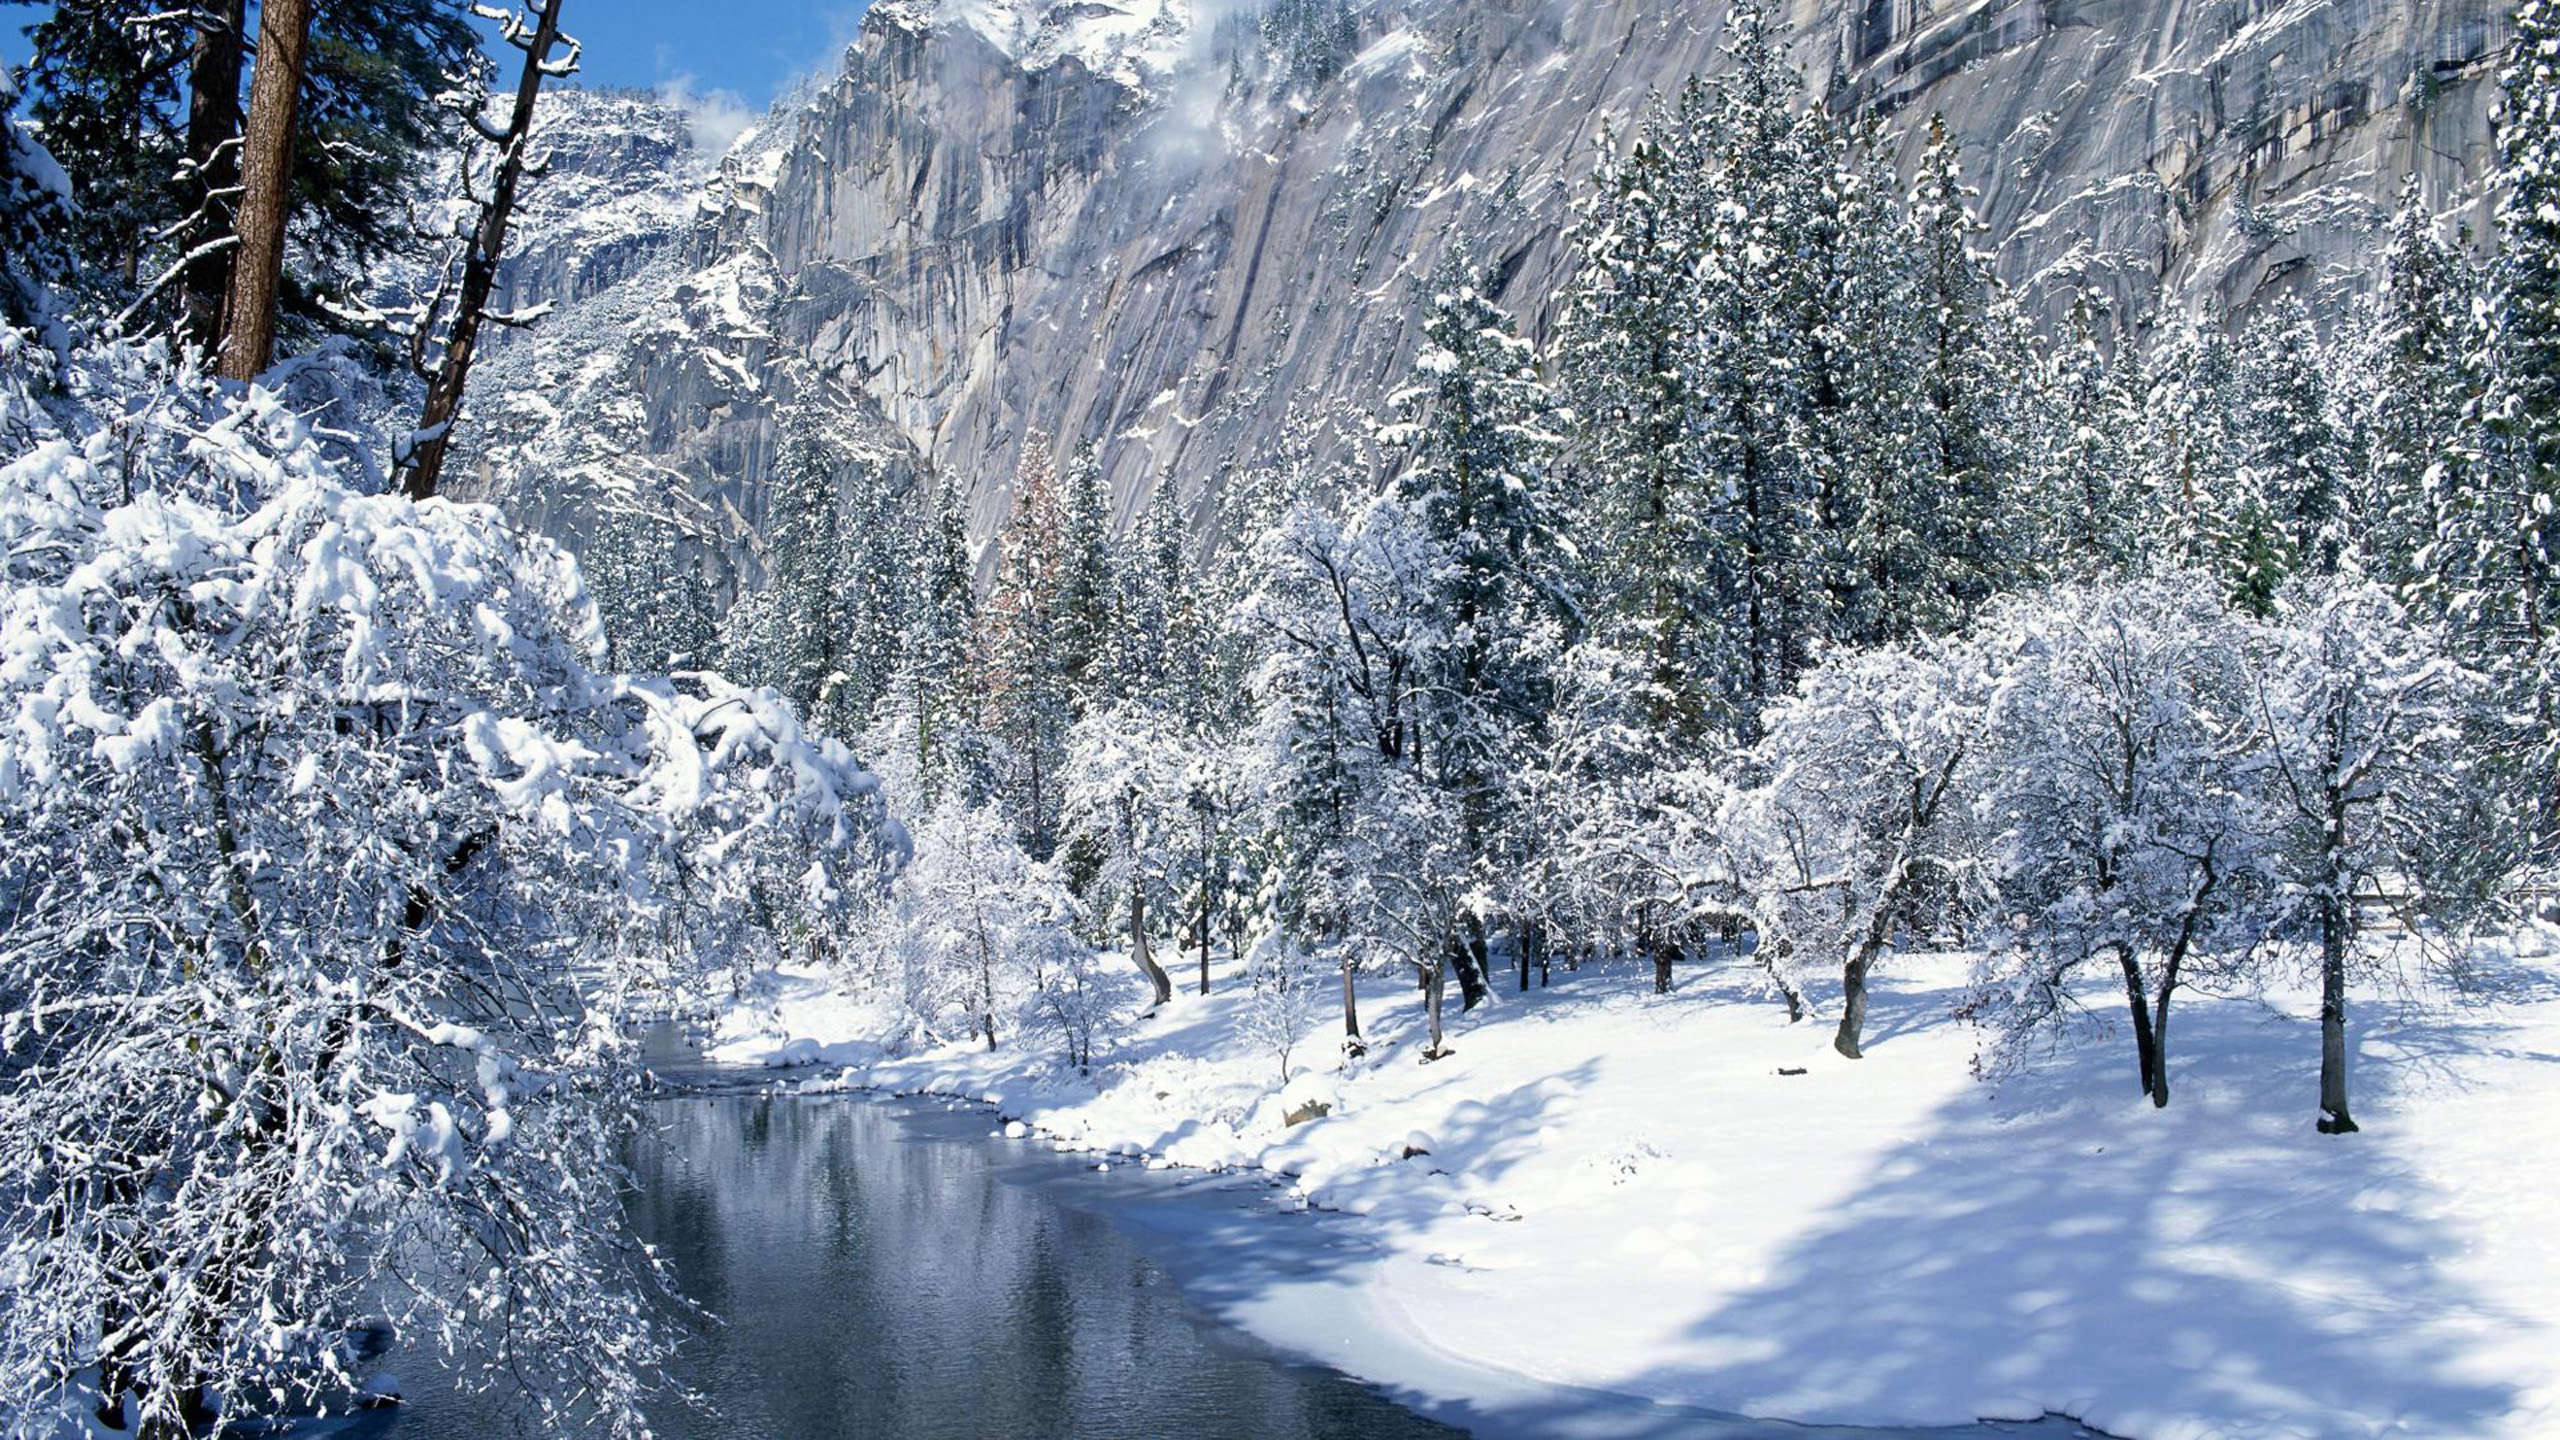 Winter Wallpapers 2560x1440